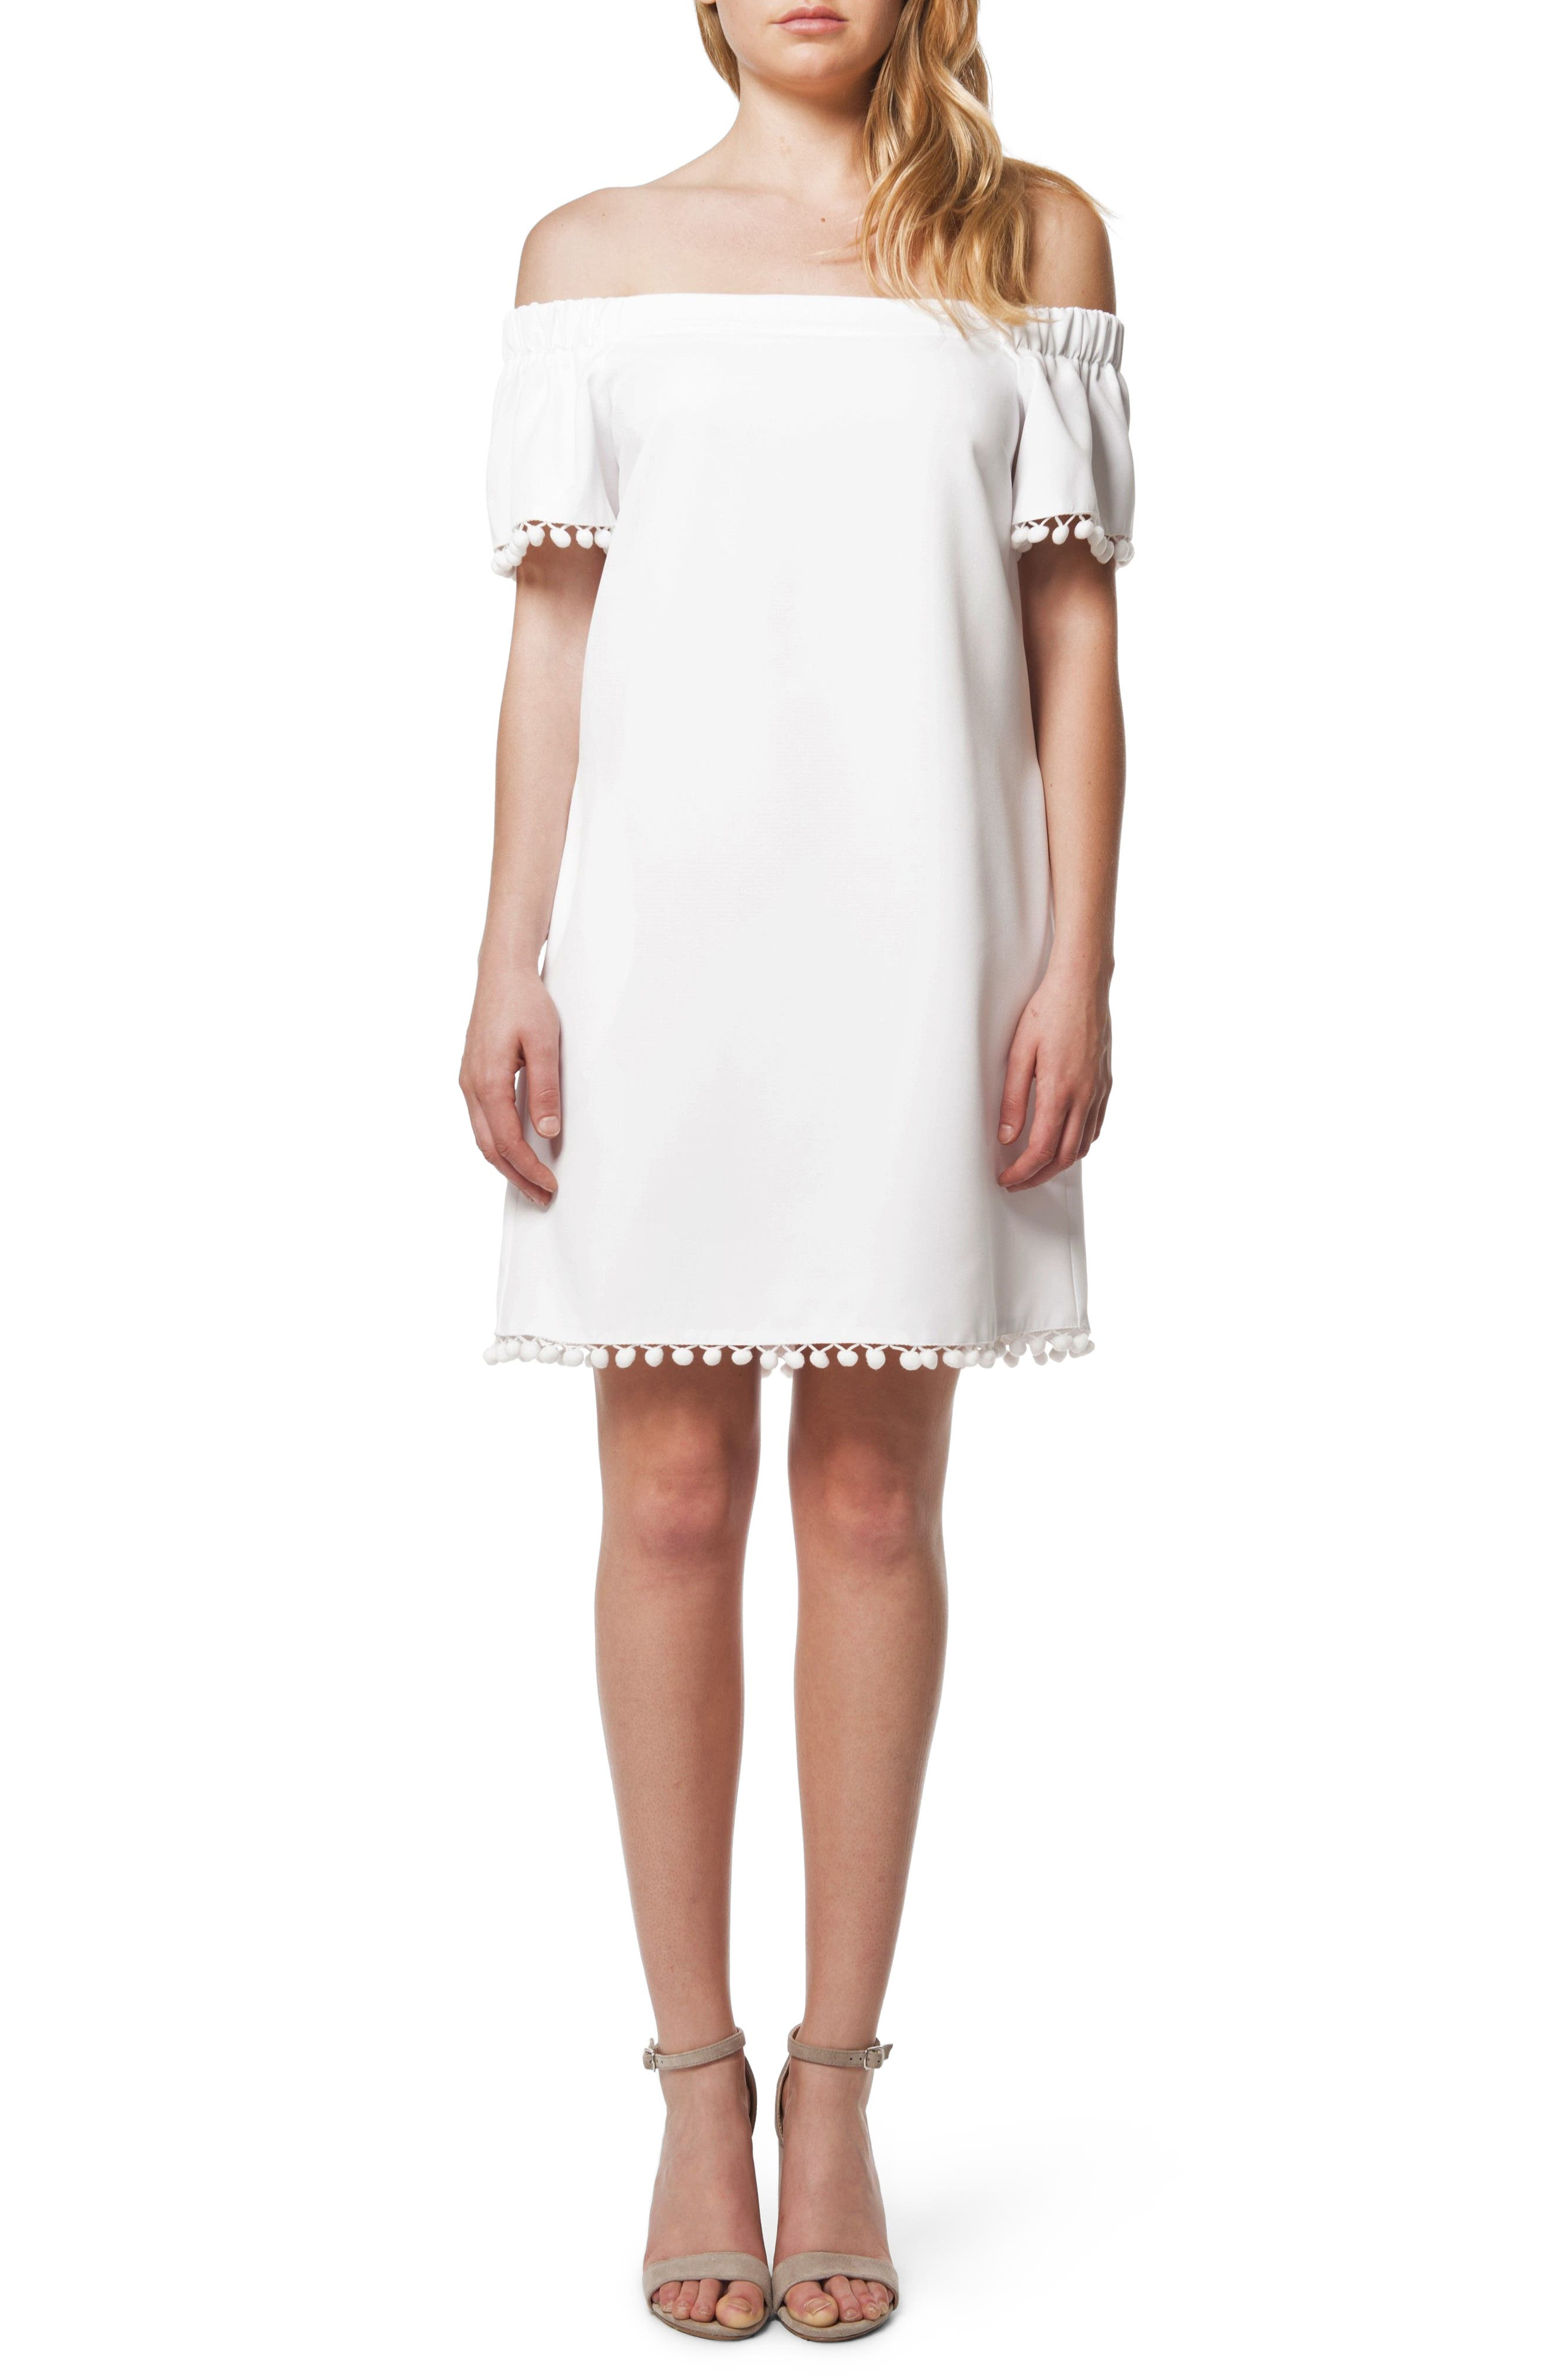 Willow & Clay Pom Pom Off the Shoulder Dress